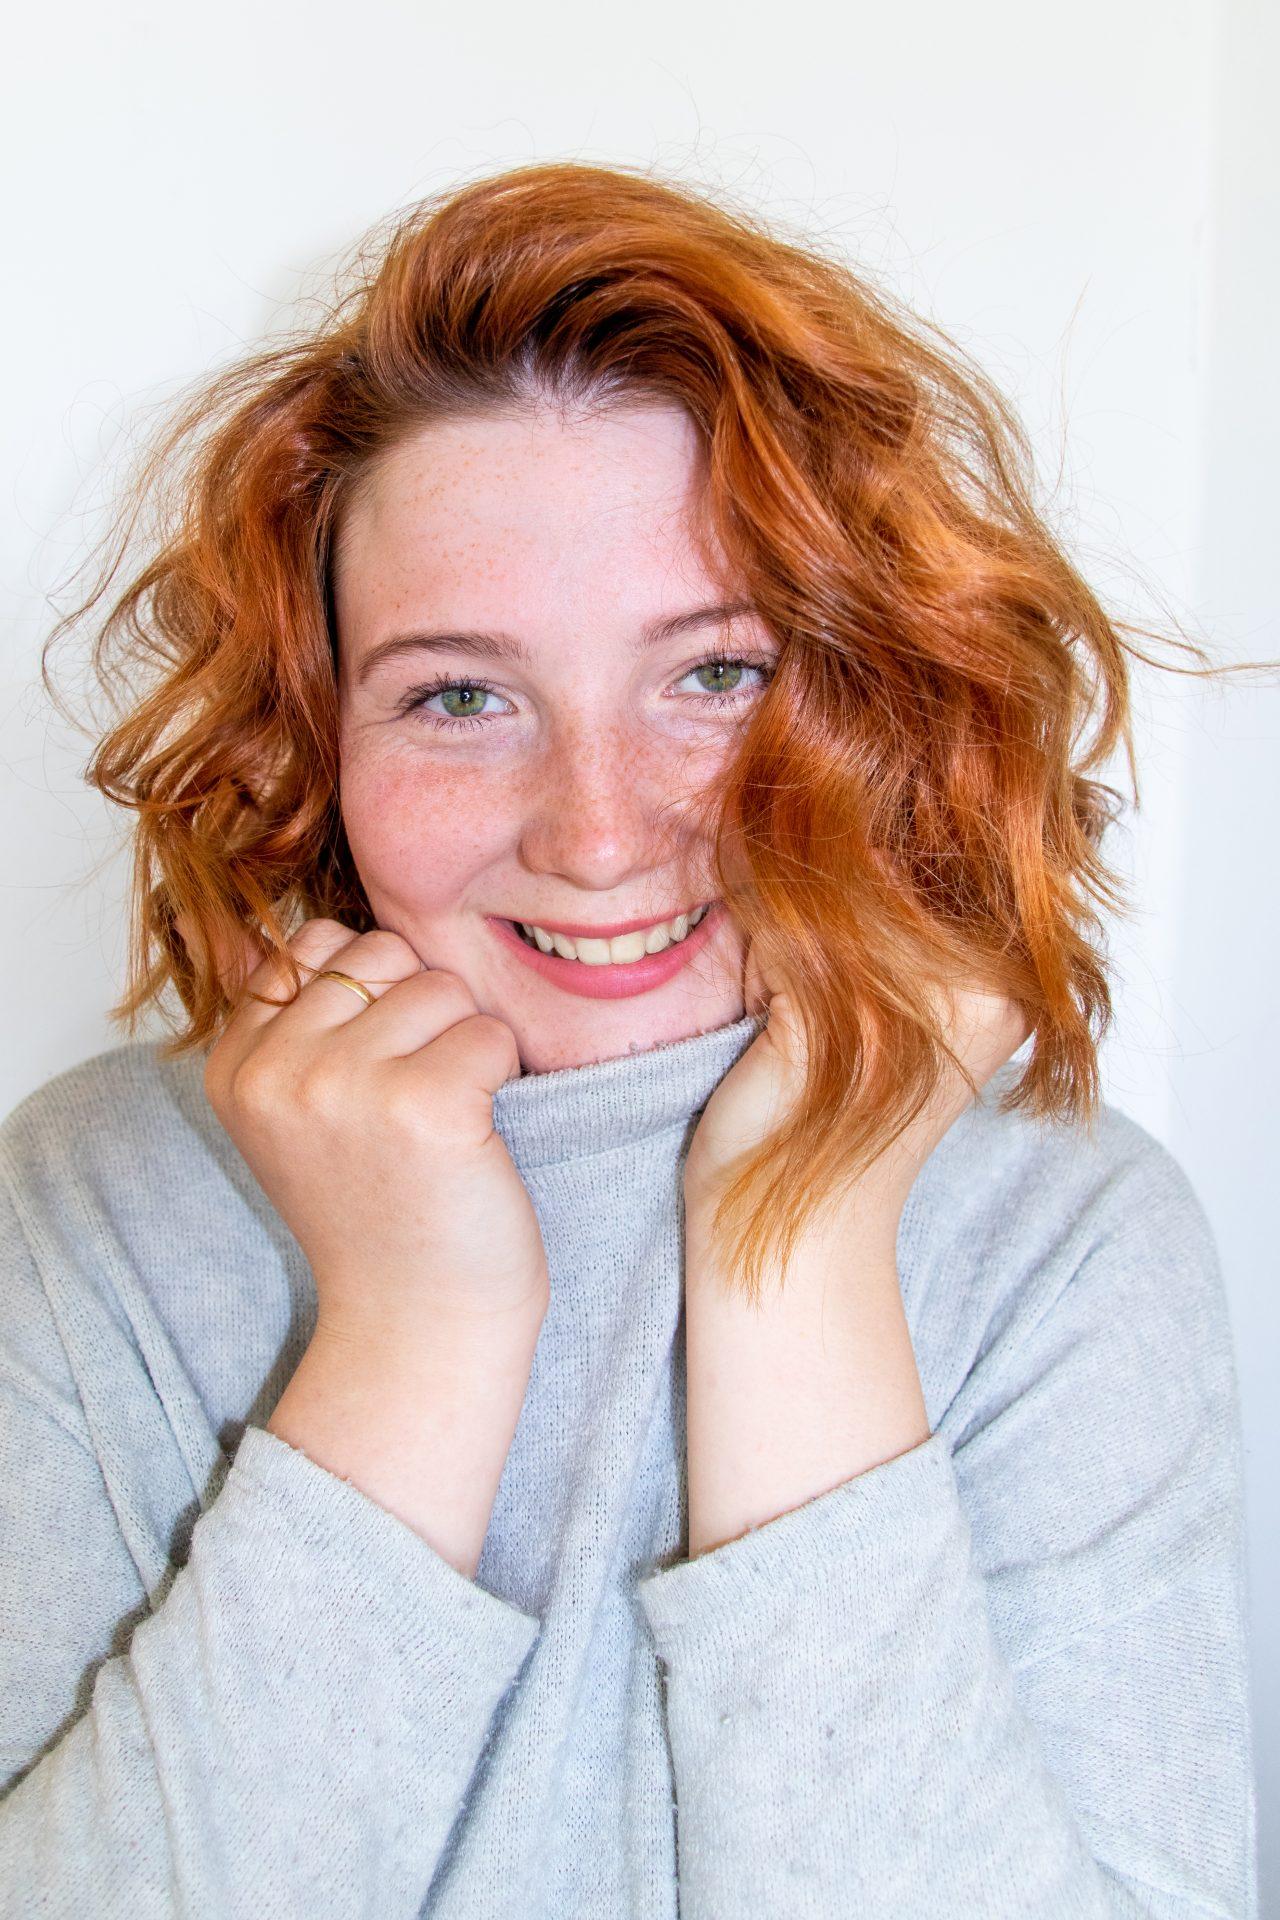 Profilbild-Luise-Kenner-Falubeli